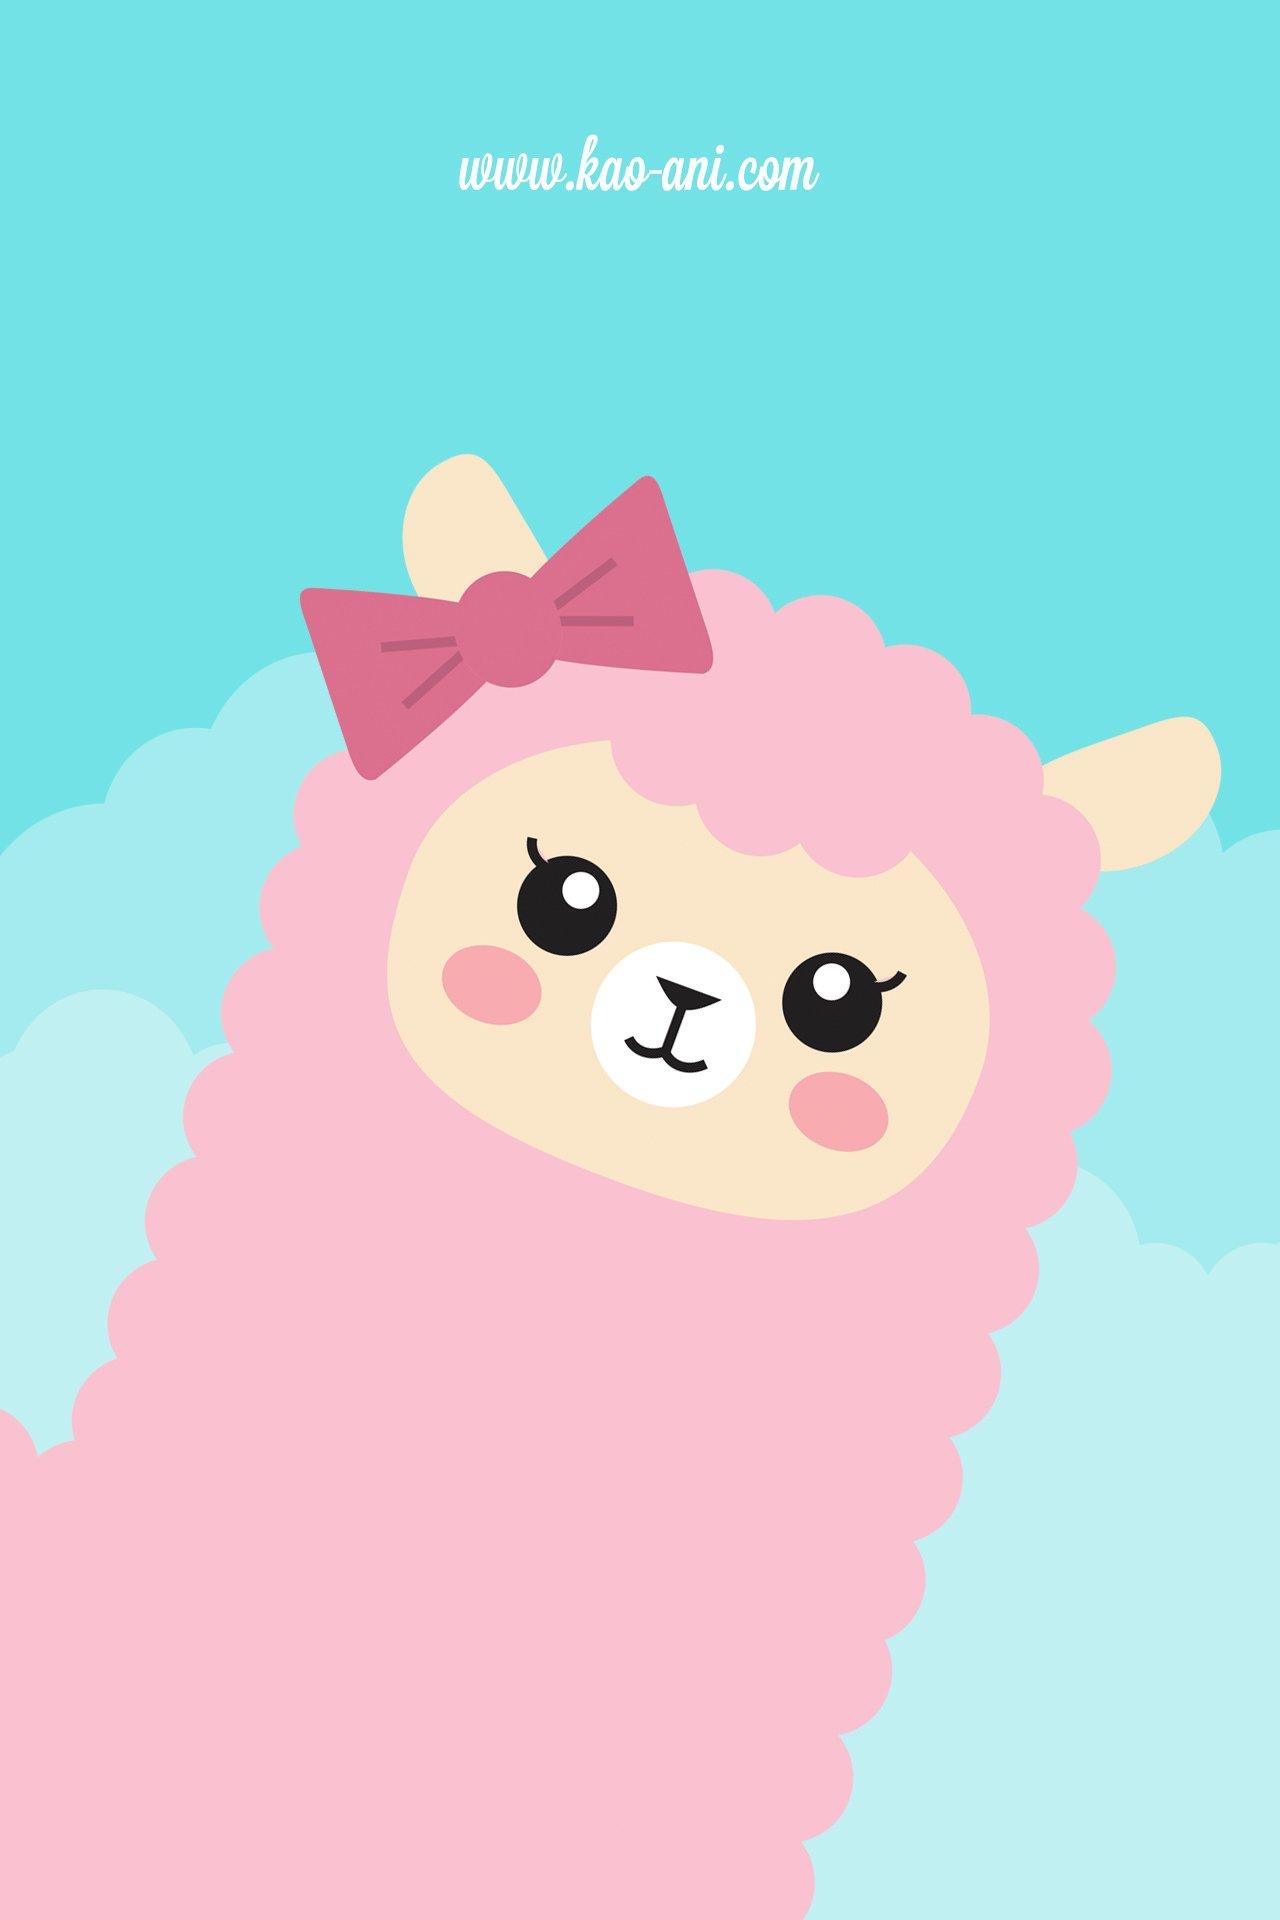 Iphone Backgrounds Tumblr Cute Alpaca iphone wallpaper 1280x1920